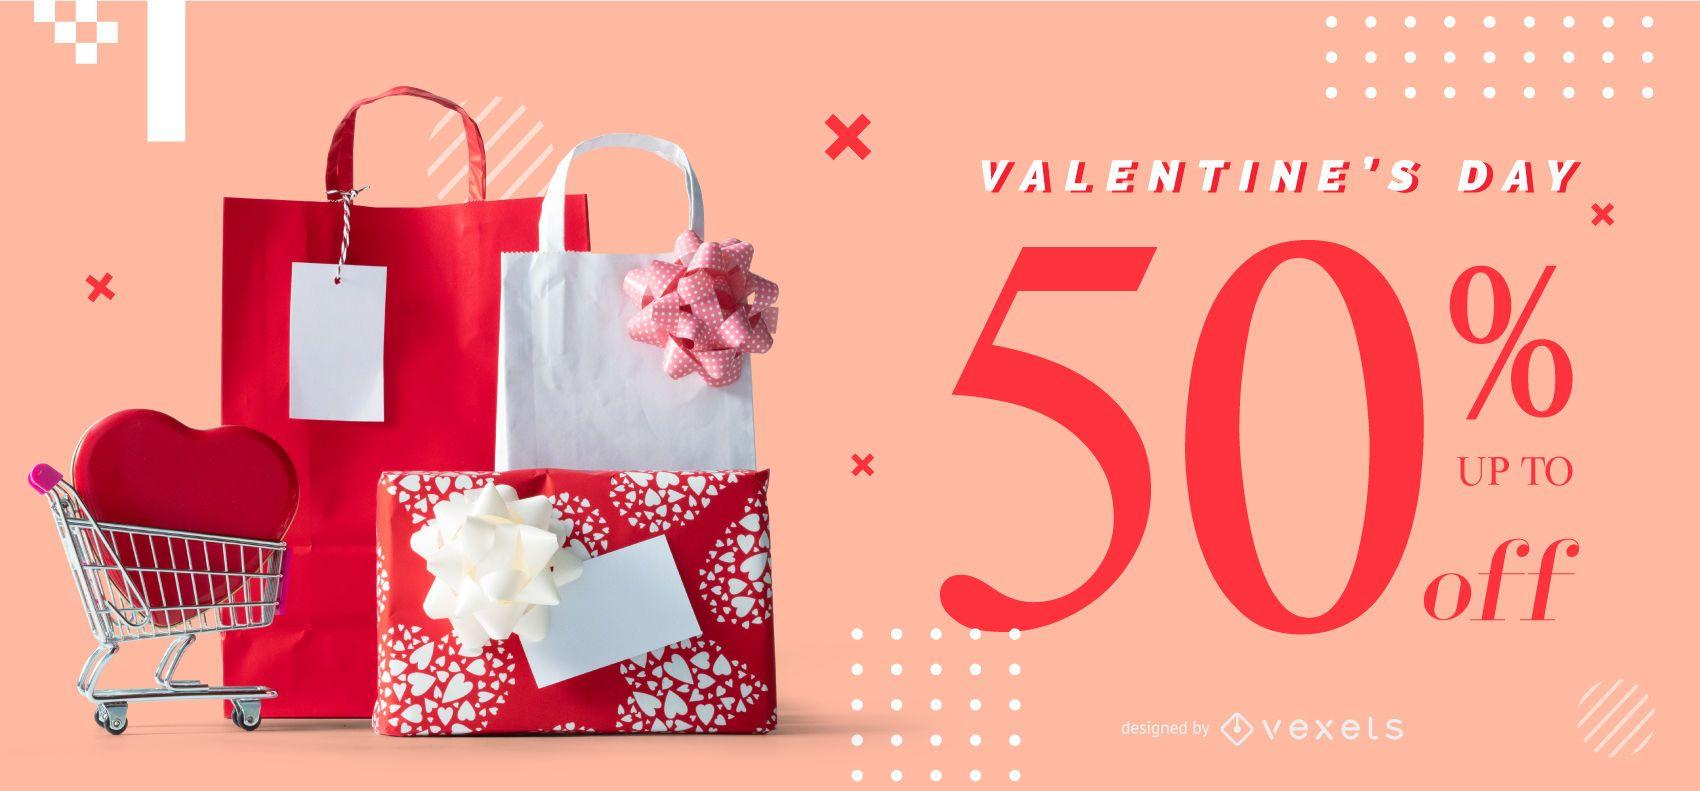 Valentines day web slider template